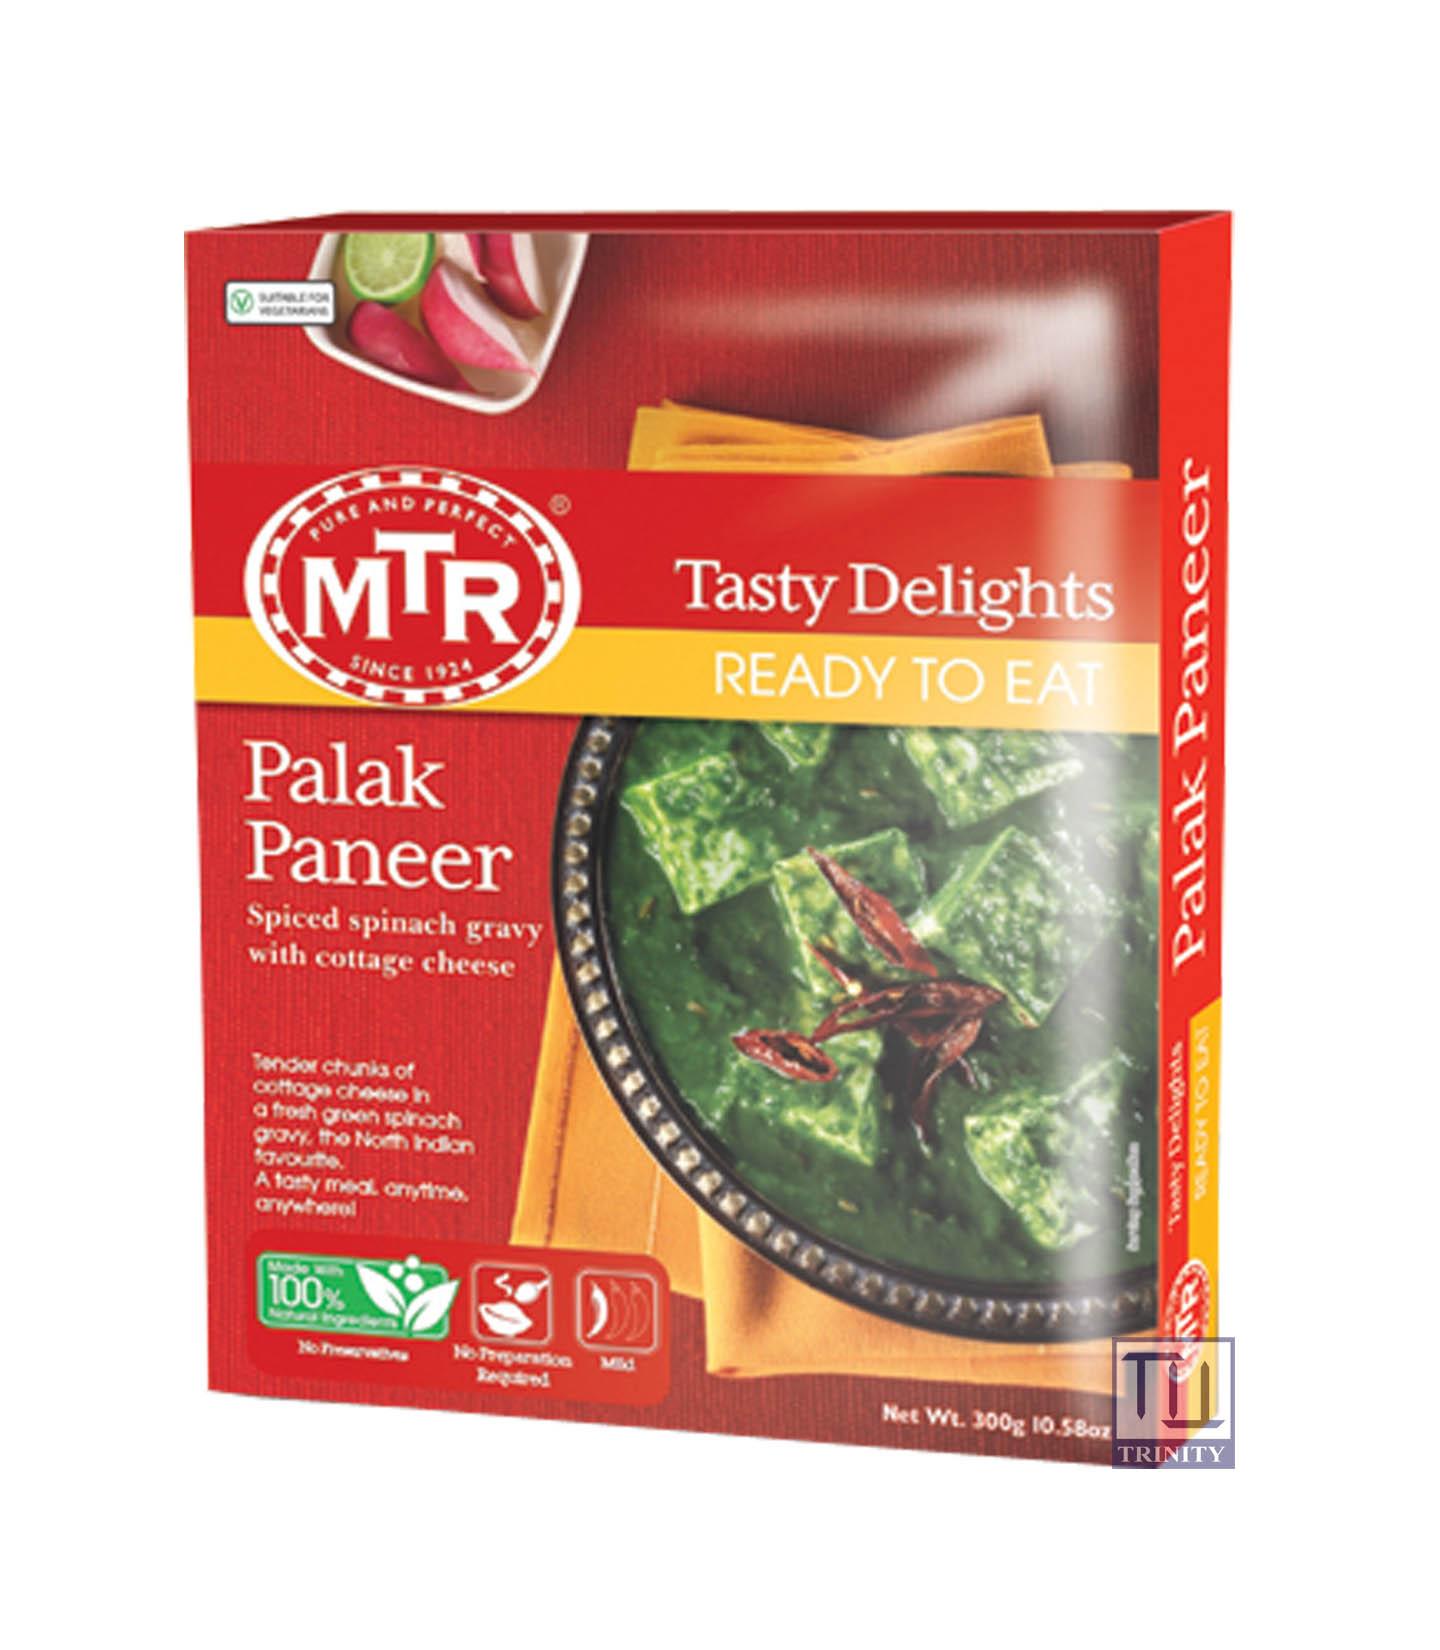 Mtr Palak Paneer 印度波菜奶酪即食調理包